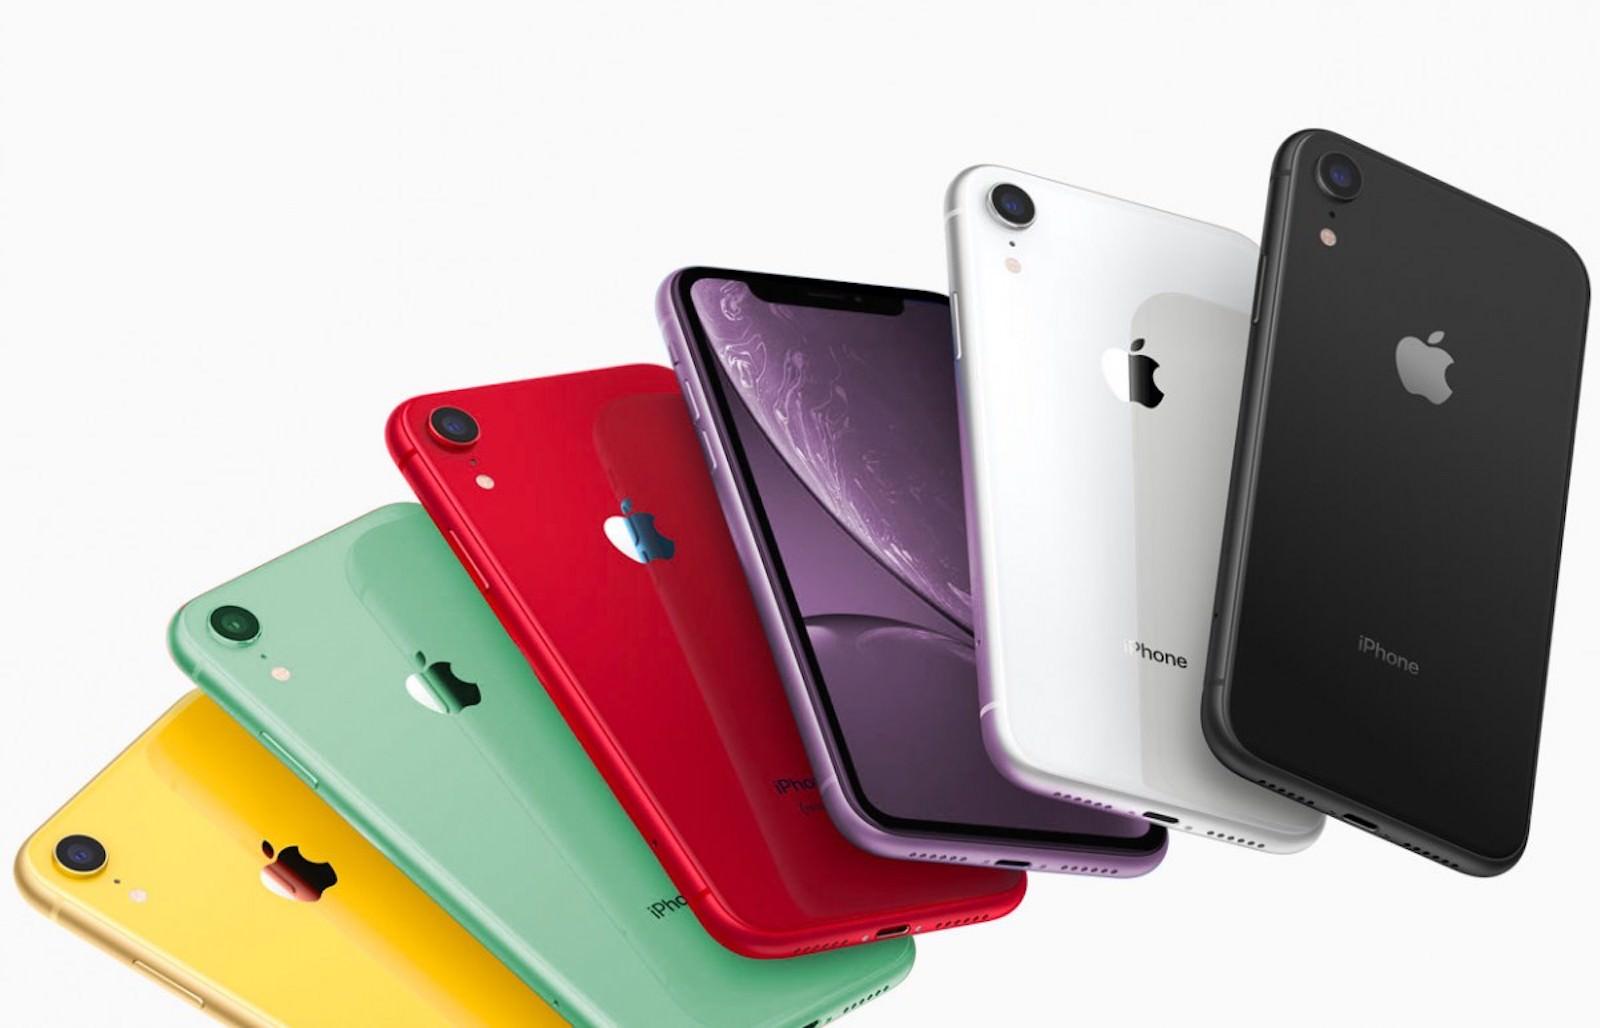 iphone-xr-coloris-2019-v2.jpg